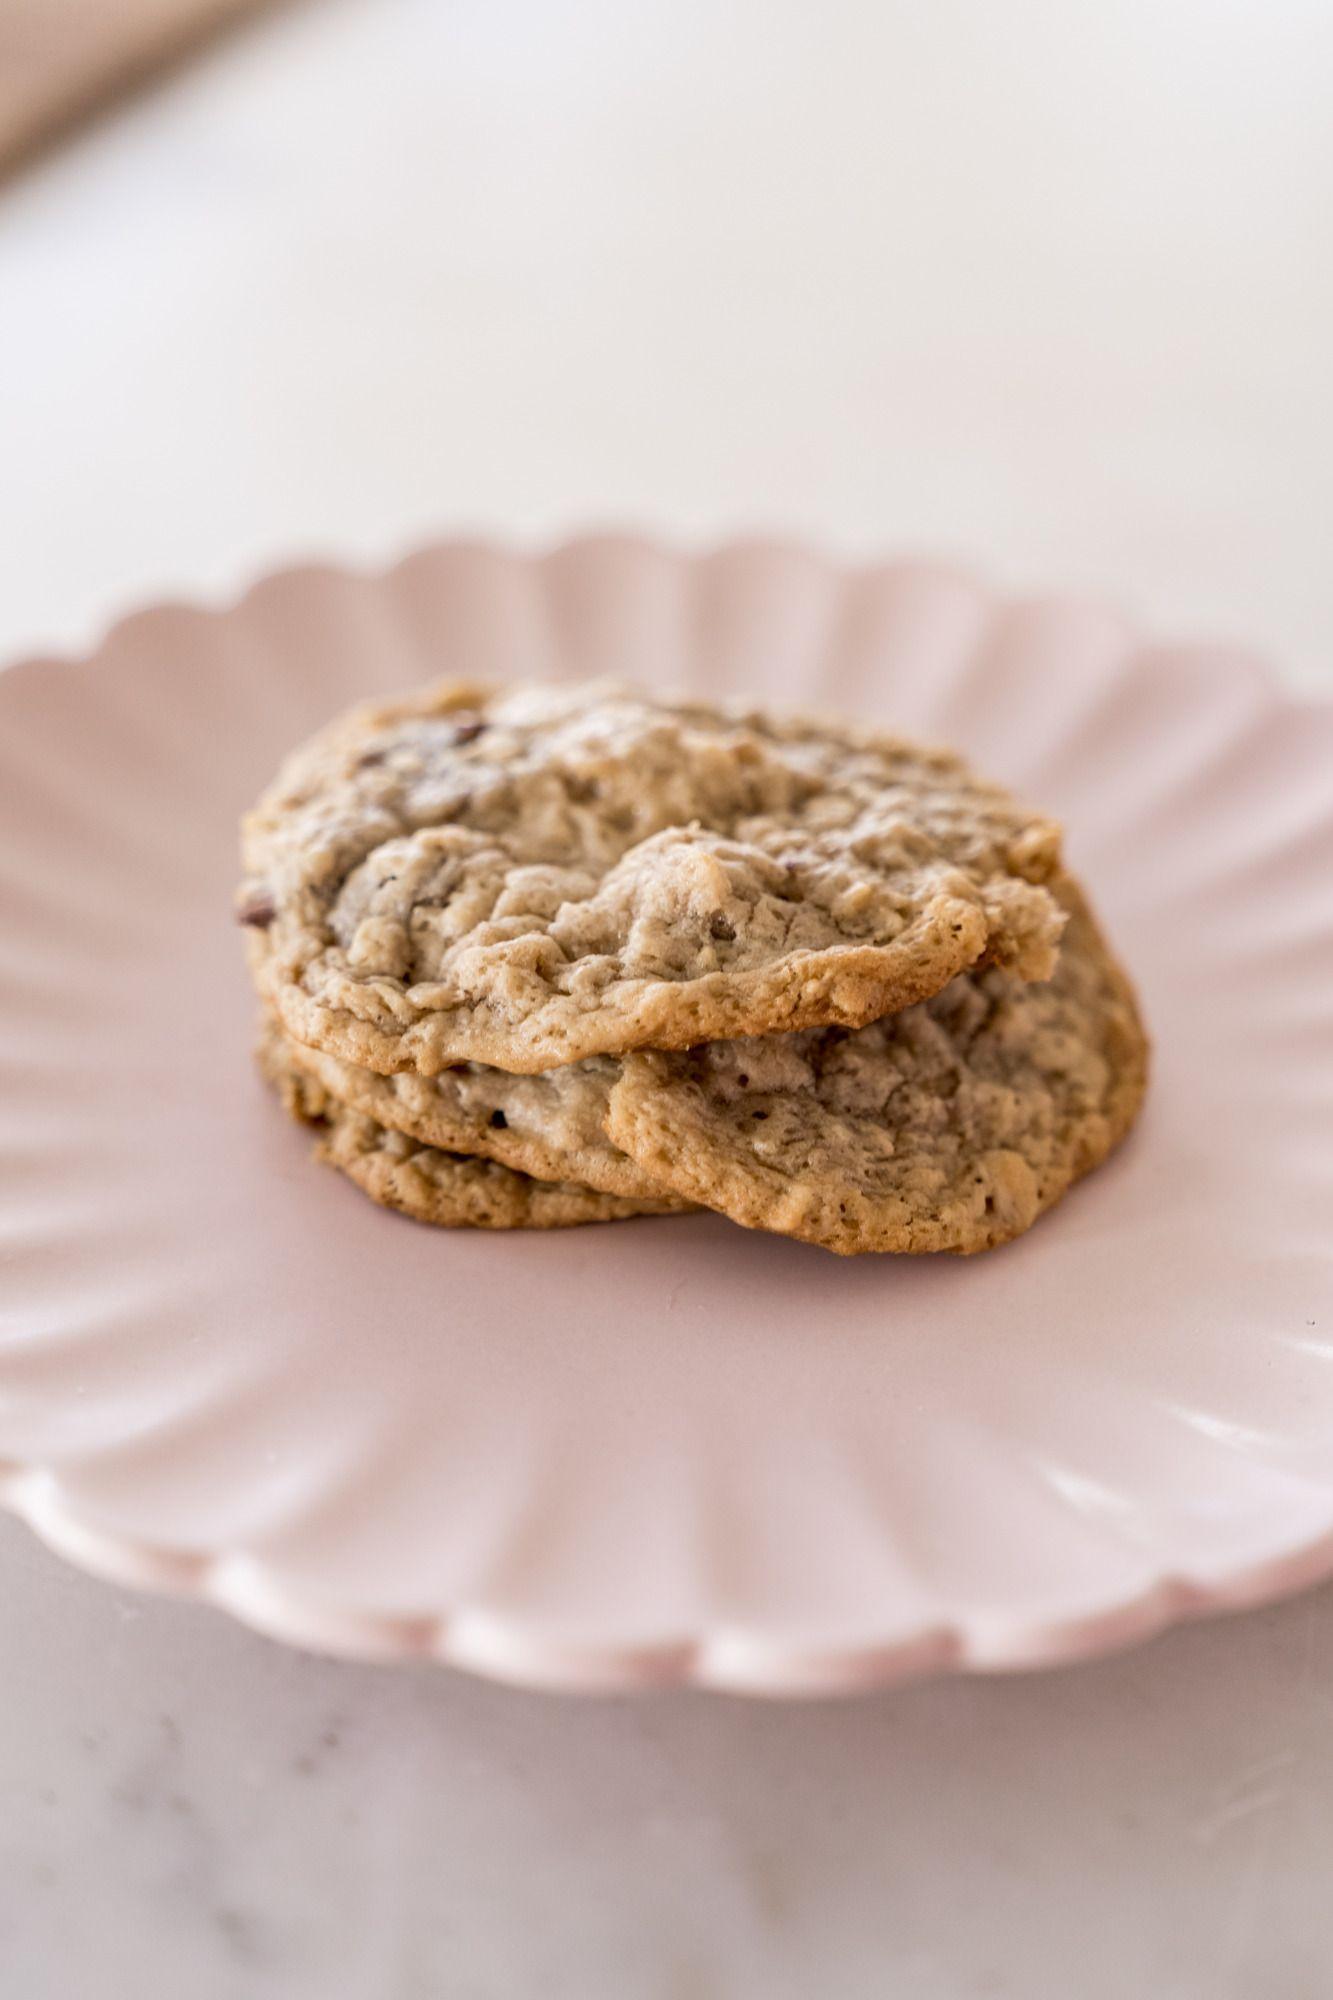 Photo of Receta de galletas favorita … – Rach Parcell